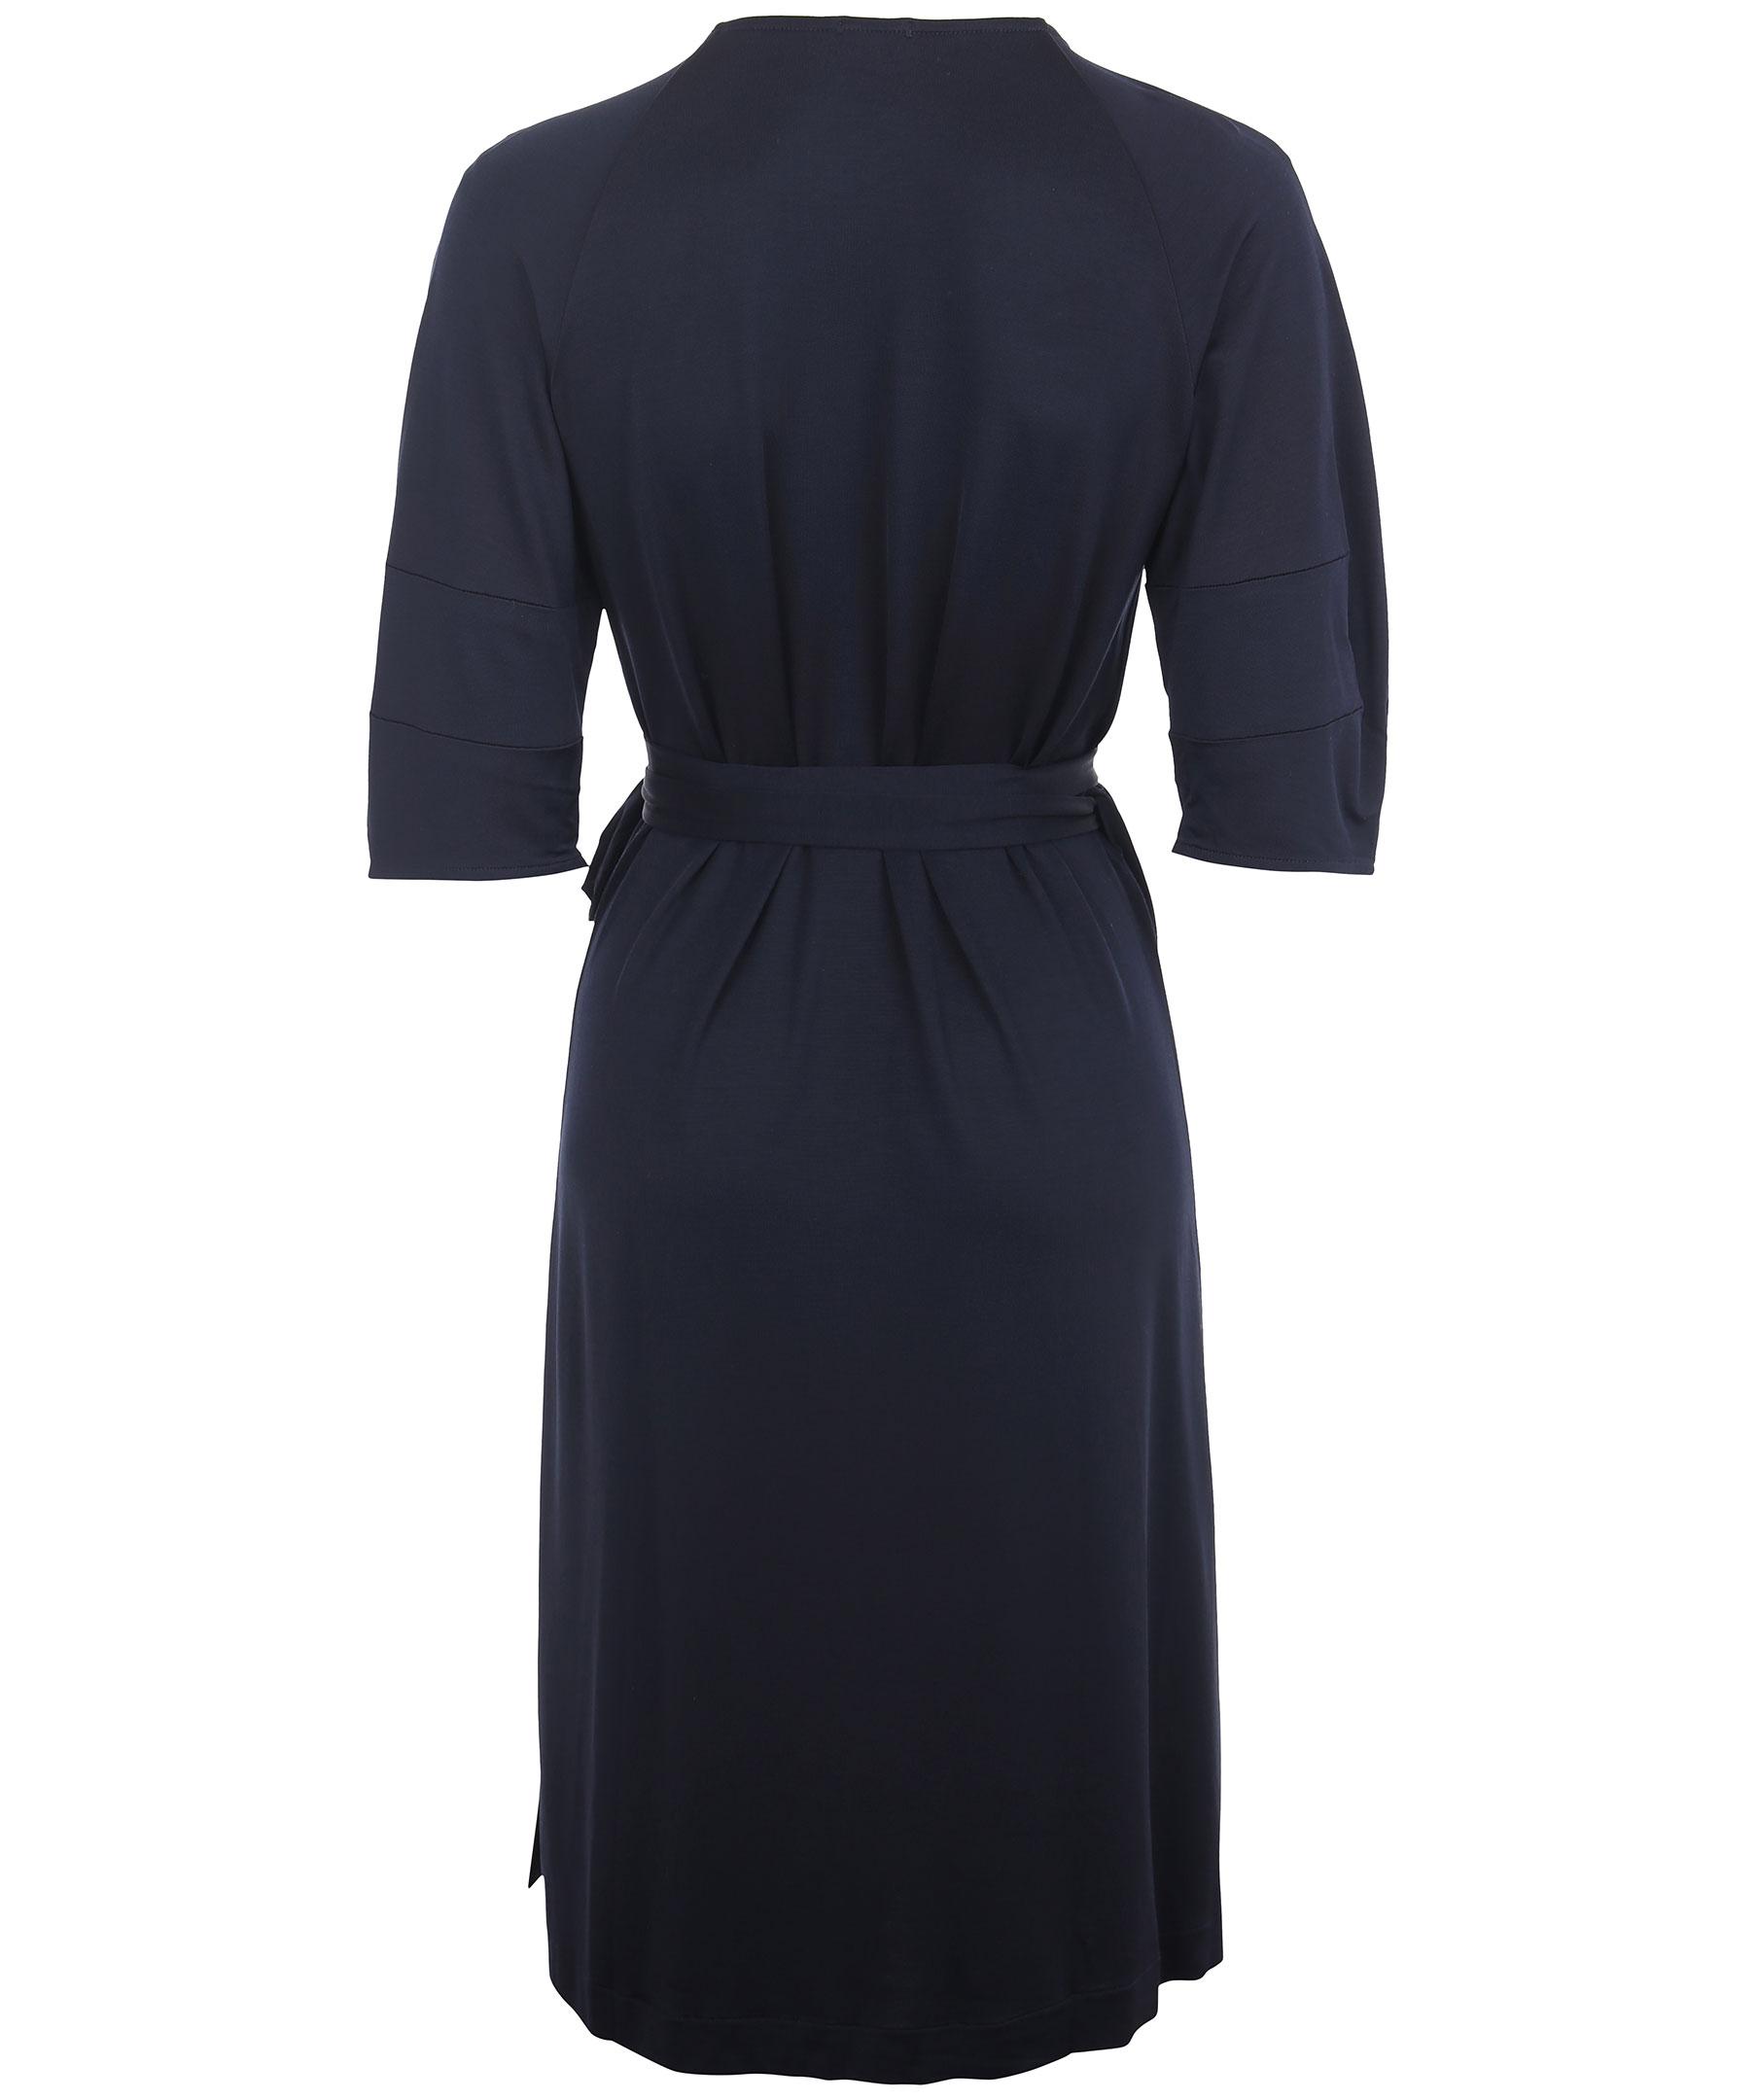 c93a3d3b9a6d Handla Filippa K Jersey wrap dress hos Johnells.se